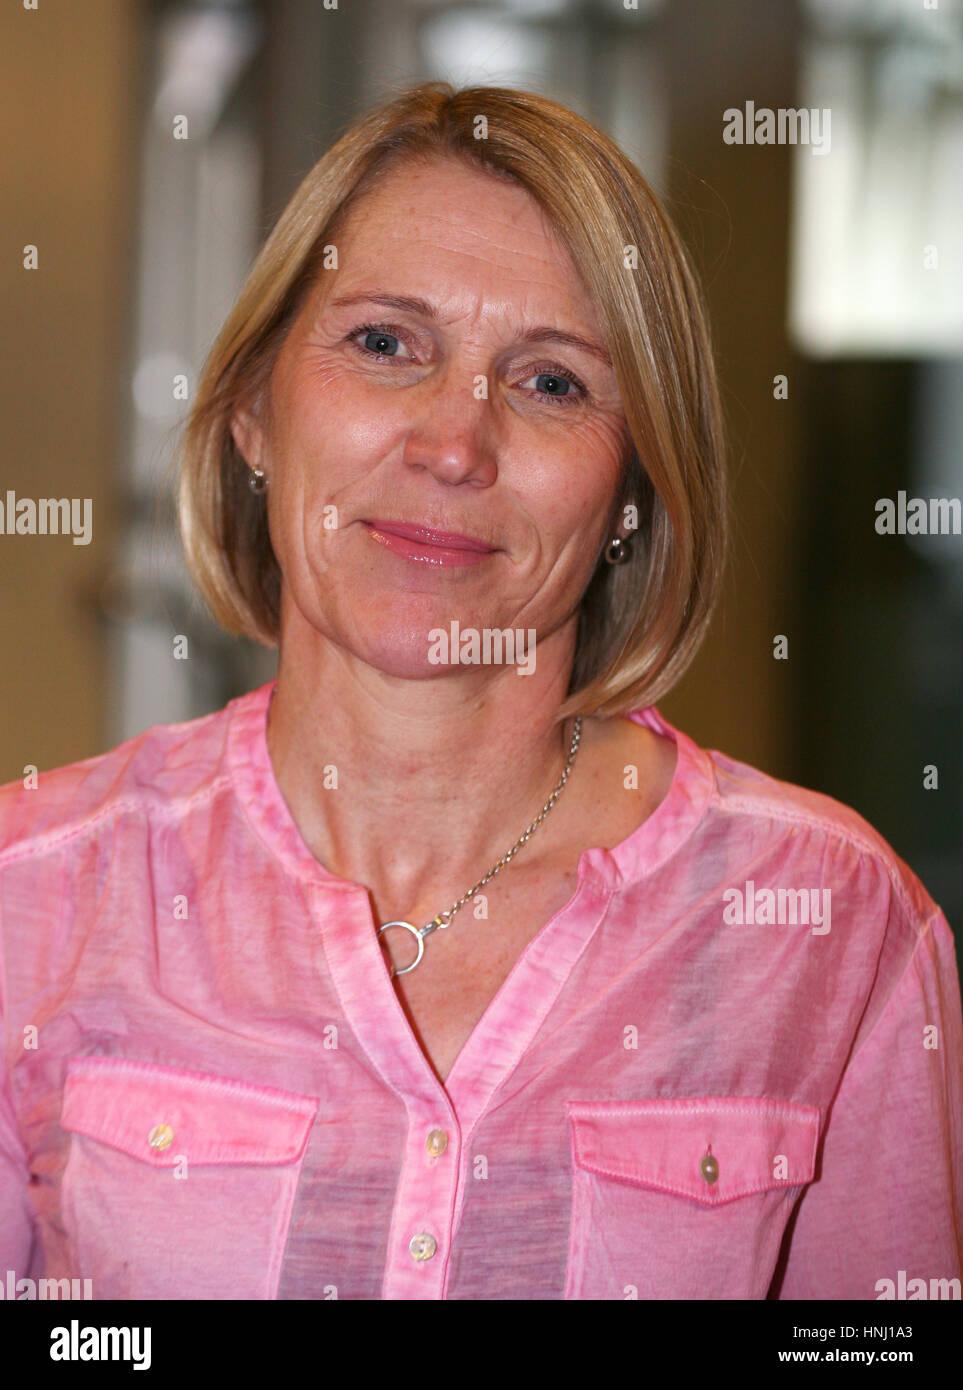 Kåta Birgitta